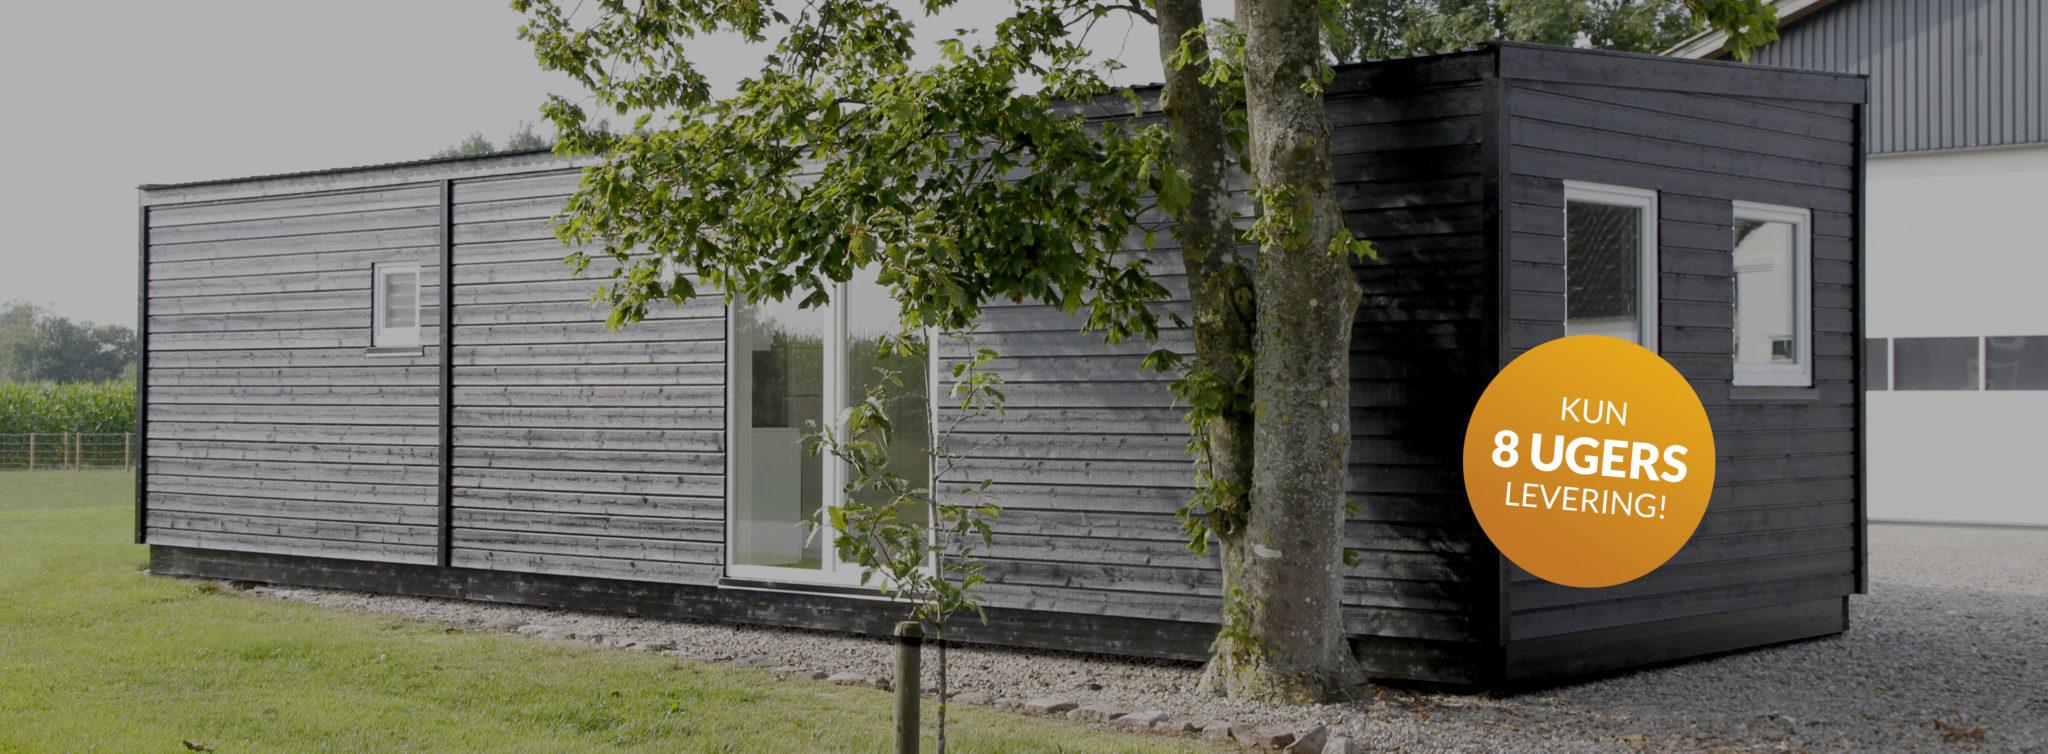 mobile og fleksible pavilloner